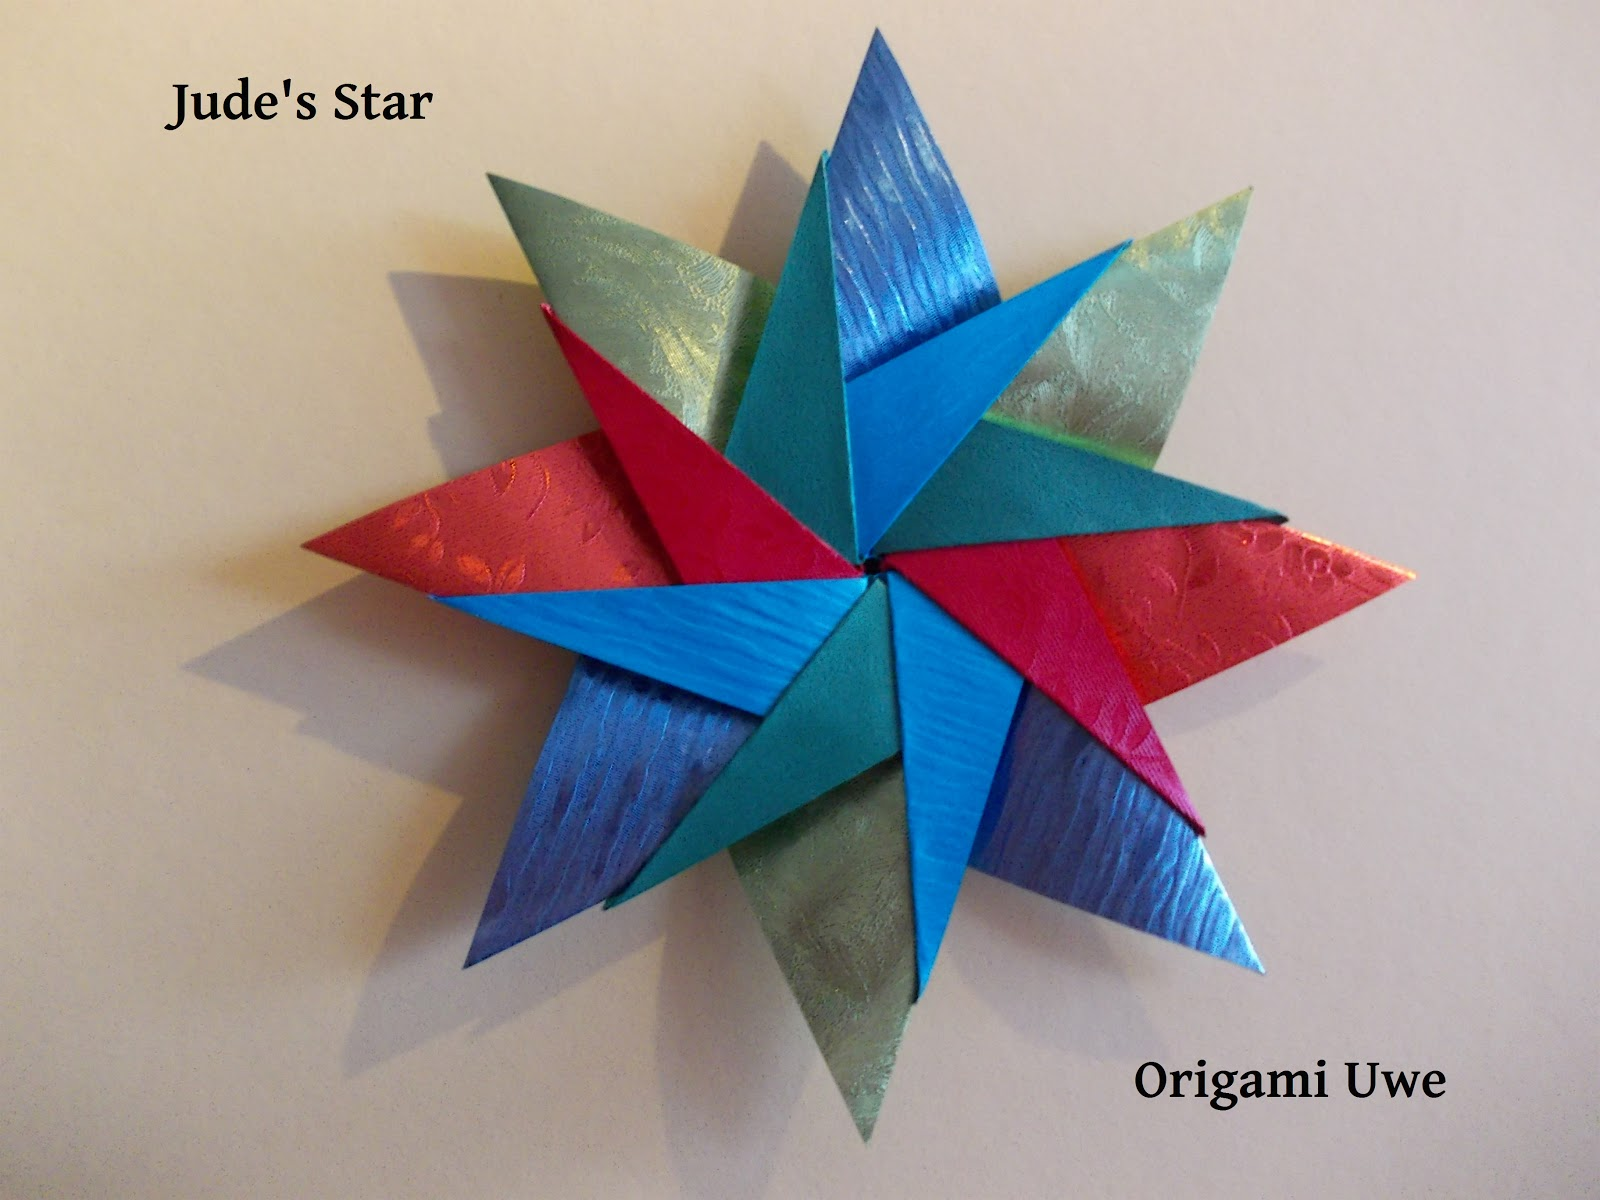 origami fleurogami und sterne jude 39 s star by ur fleurogami. Black Bedroom Furniture Sets. Home Design Ideas